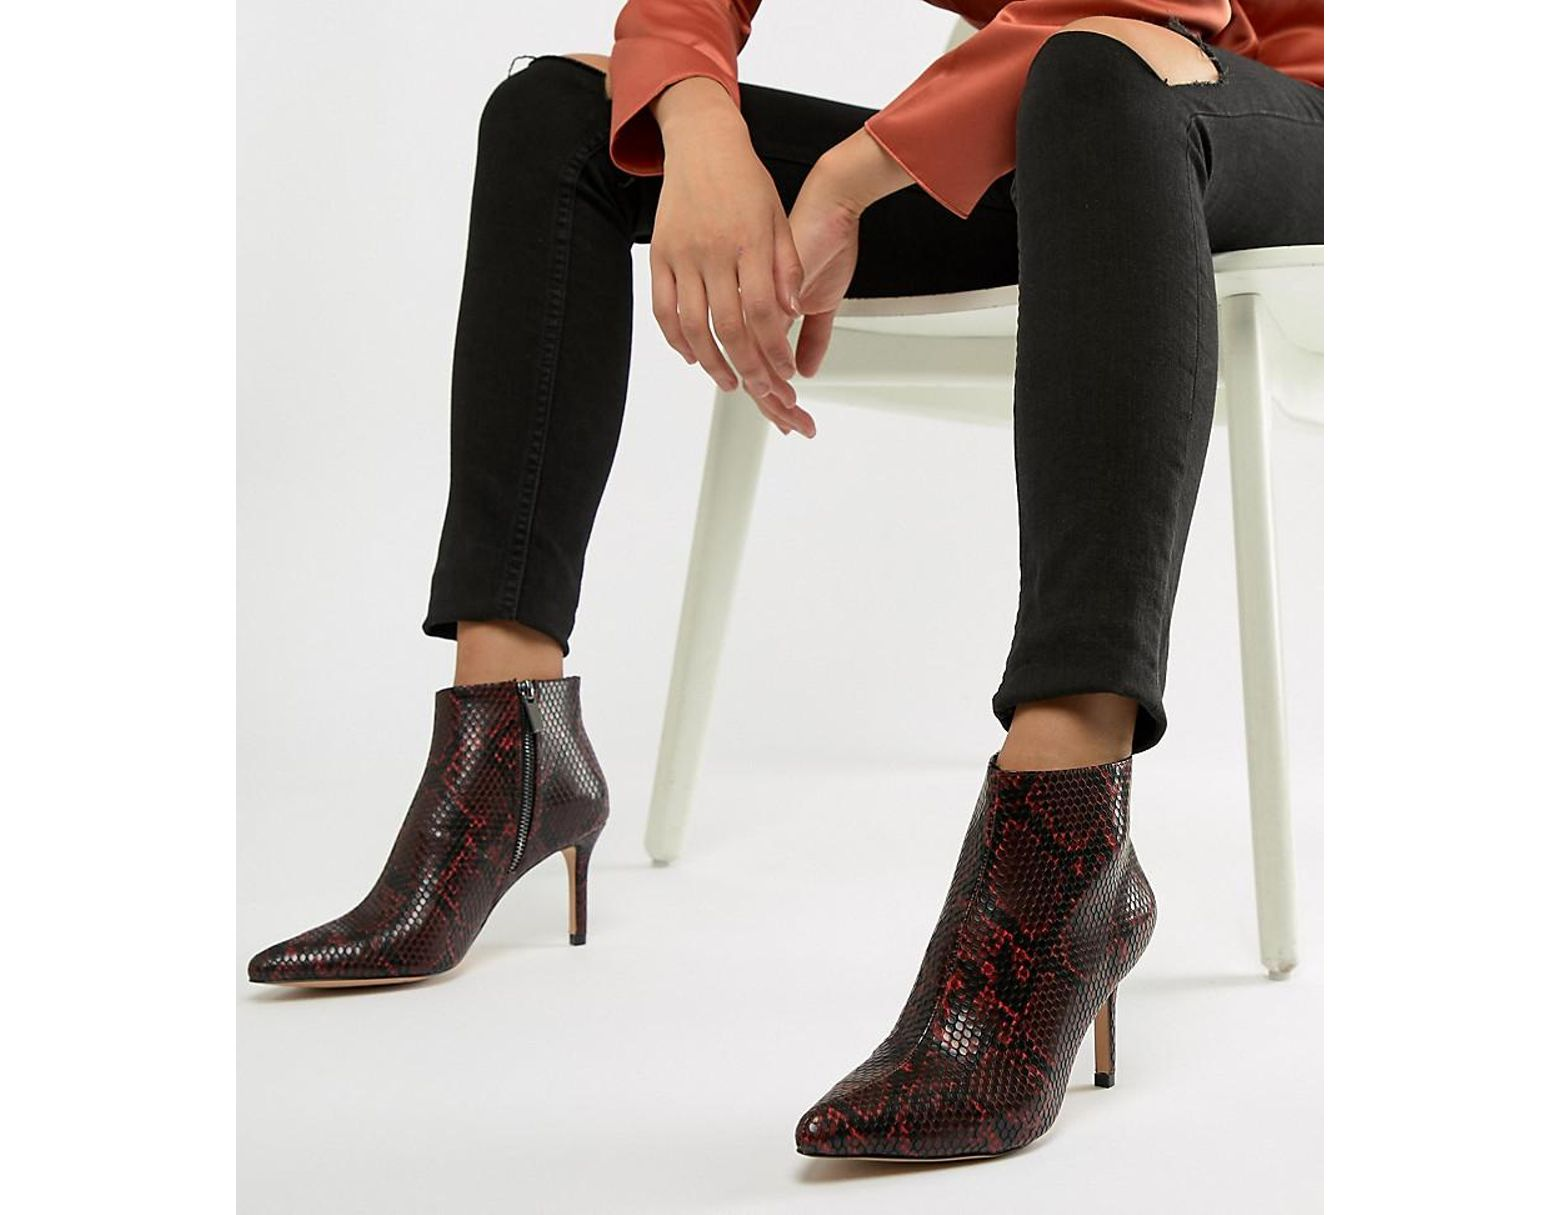 76f5c48881c9 Stradivarius Heeled Ankle Boot In Snake Print in Brown - Lyst